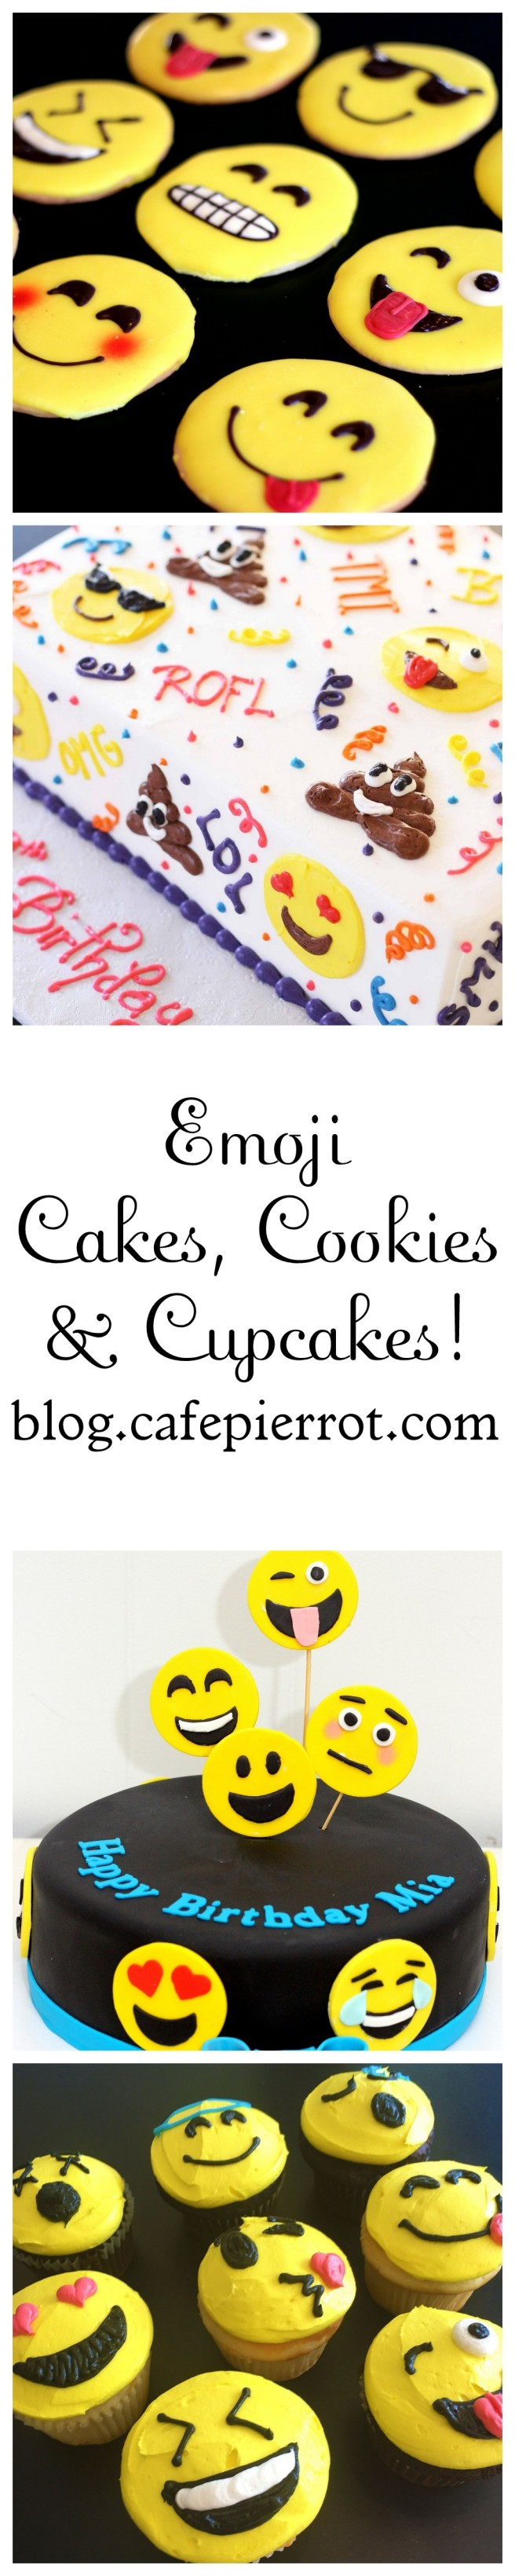 5 18 emoji blog post collage